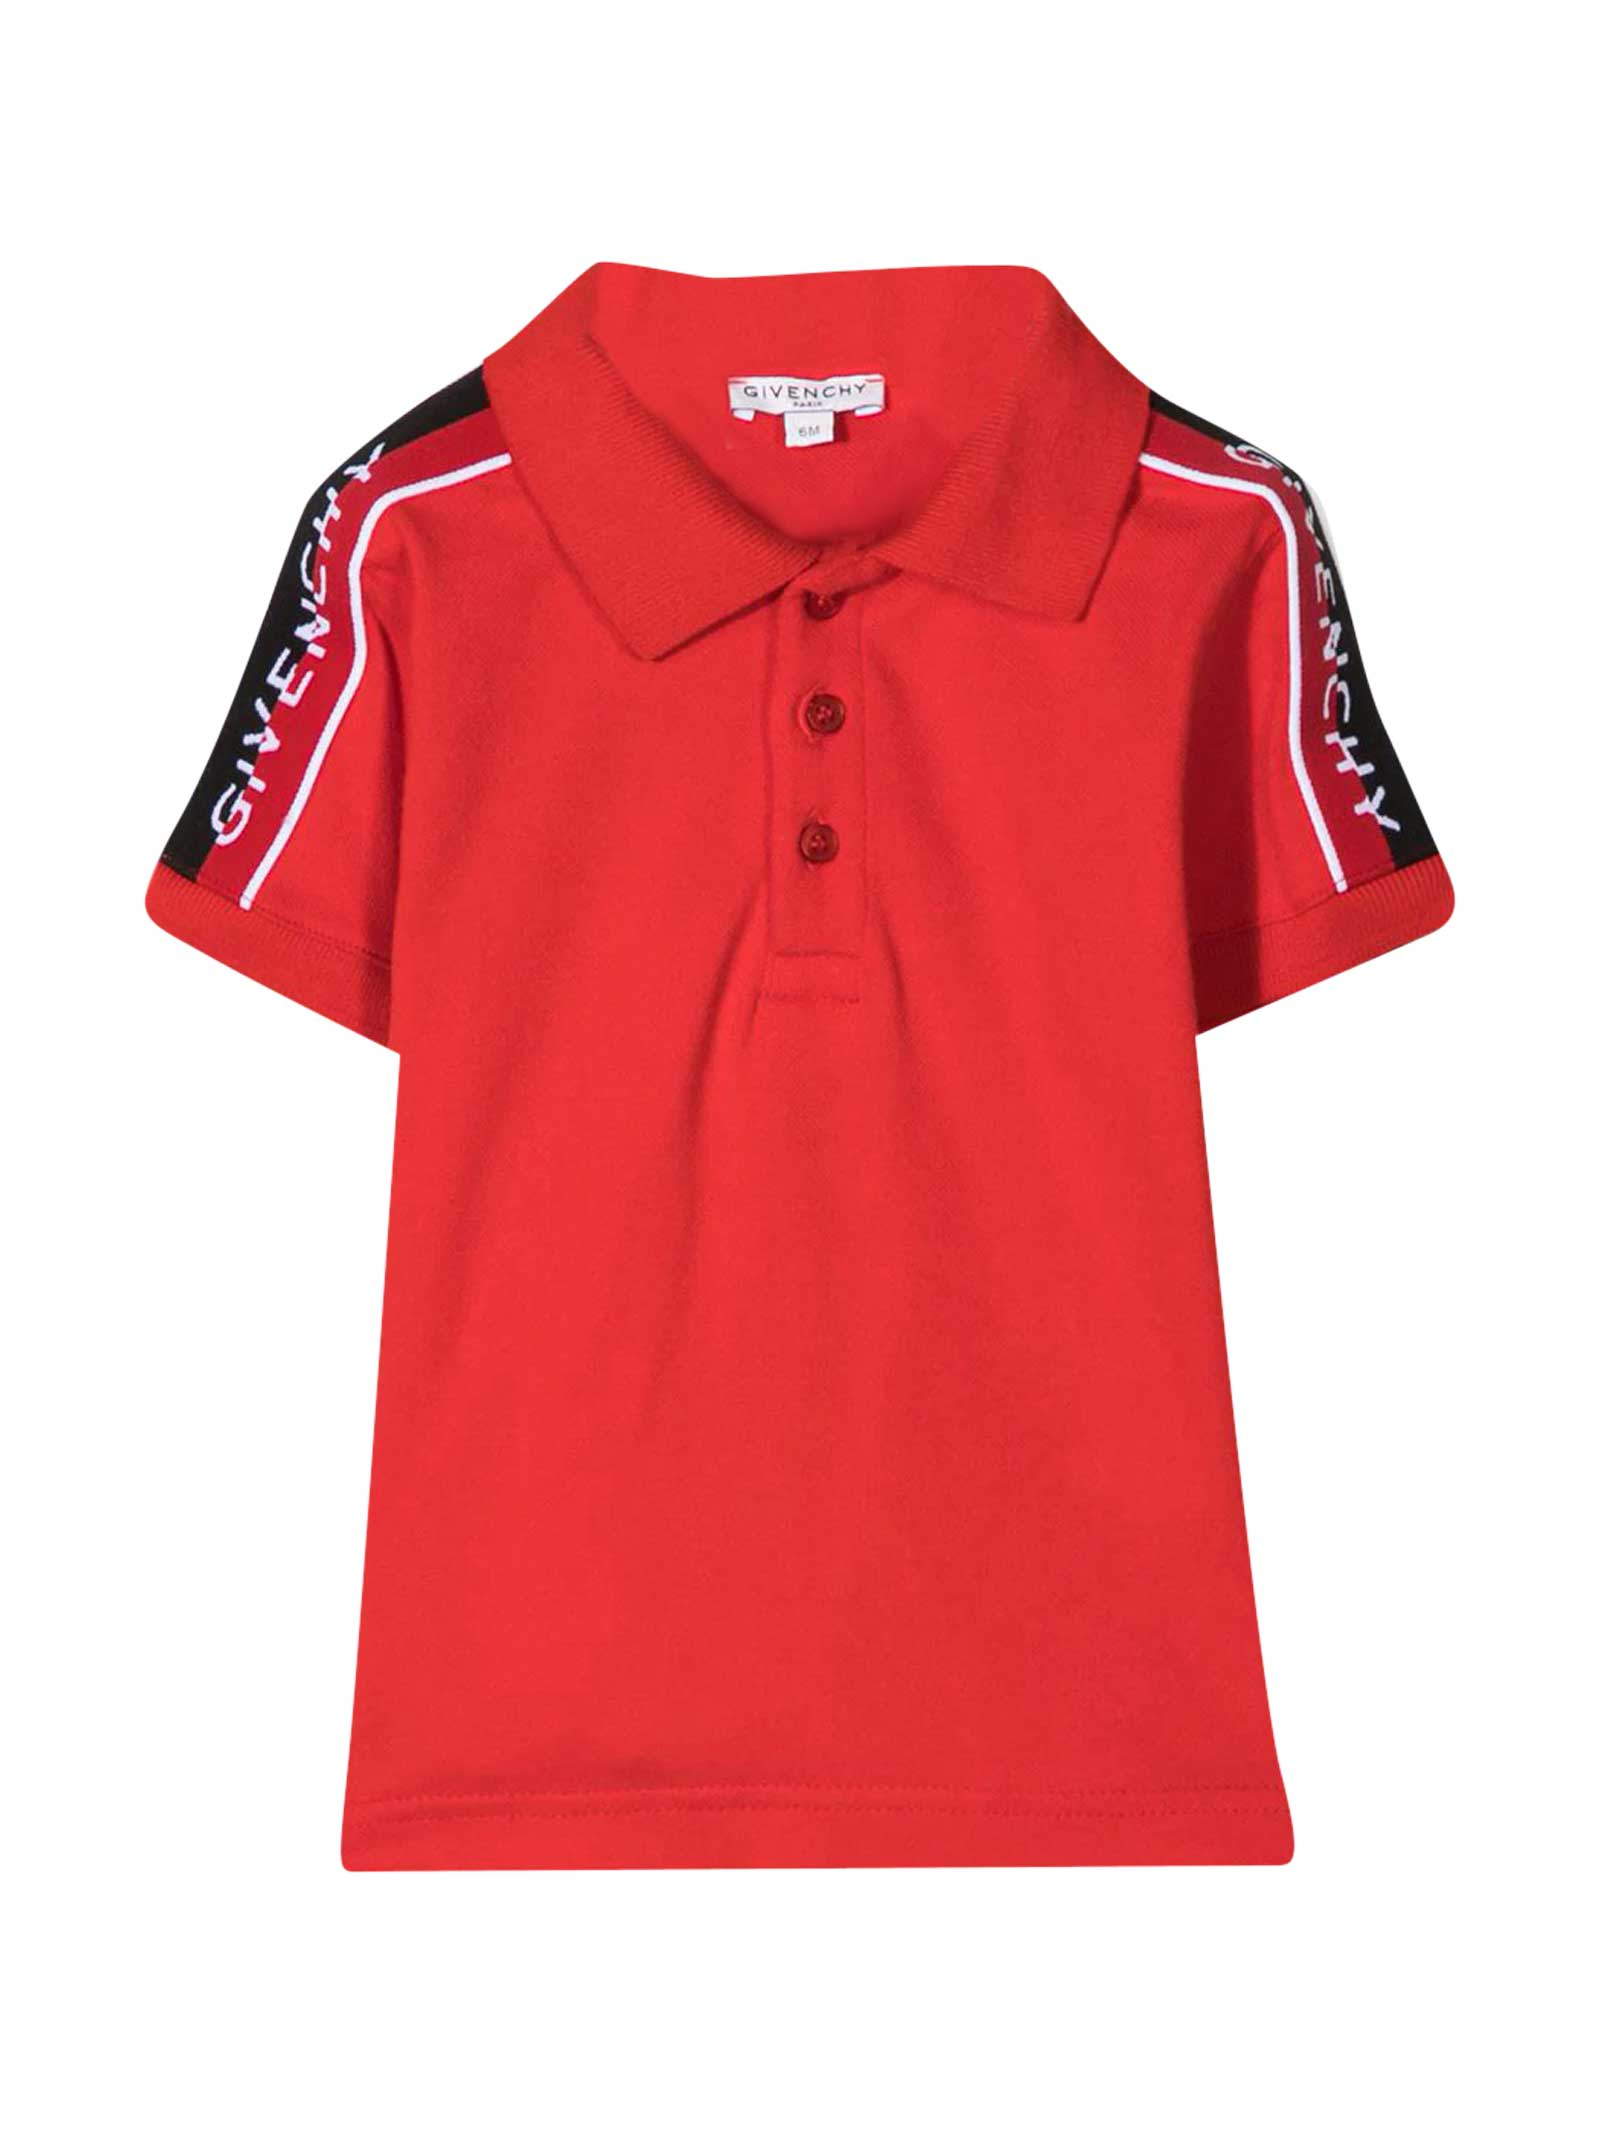 Givenchy Polo Shirt With Intarsia